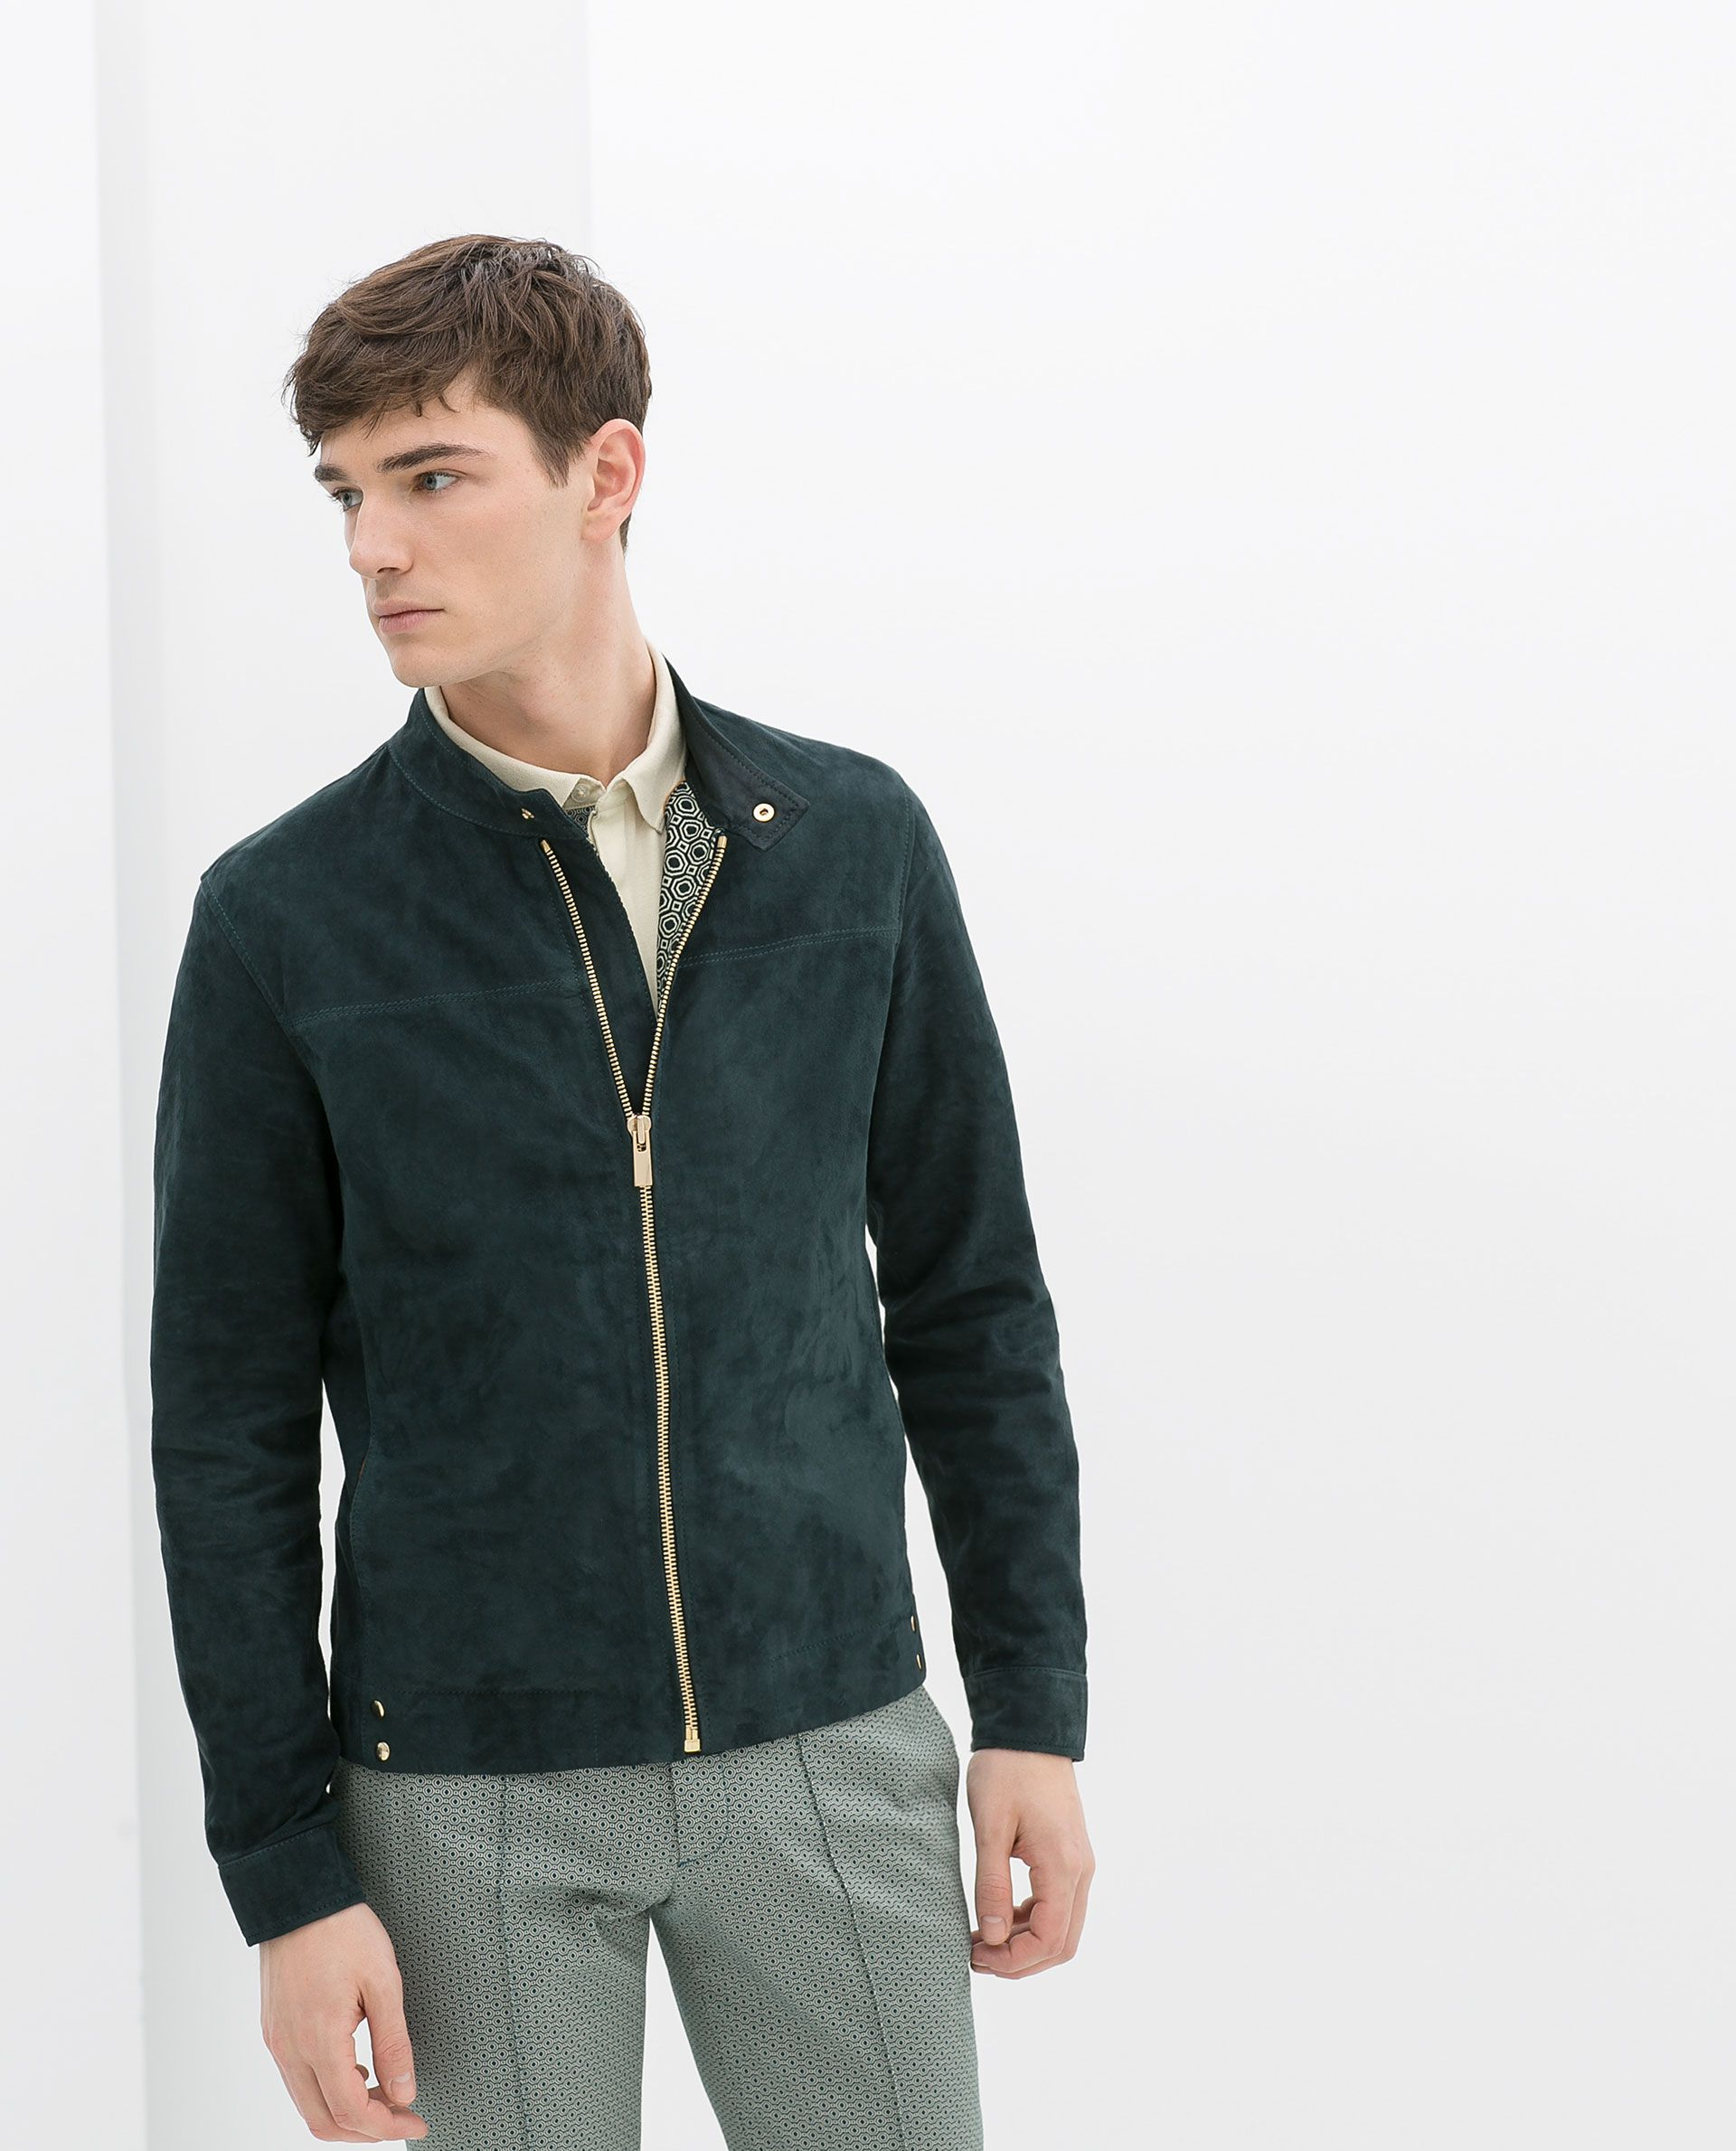 0c3a0d43 ZARA - MAN - SUEDE JACKET | sartorialism | Suede jacket, Zara ...